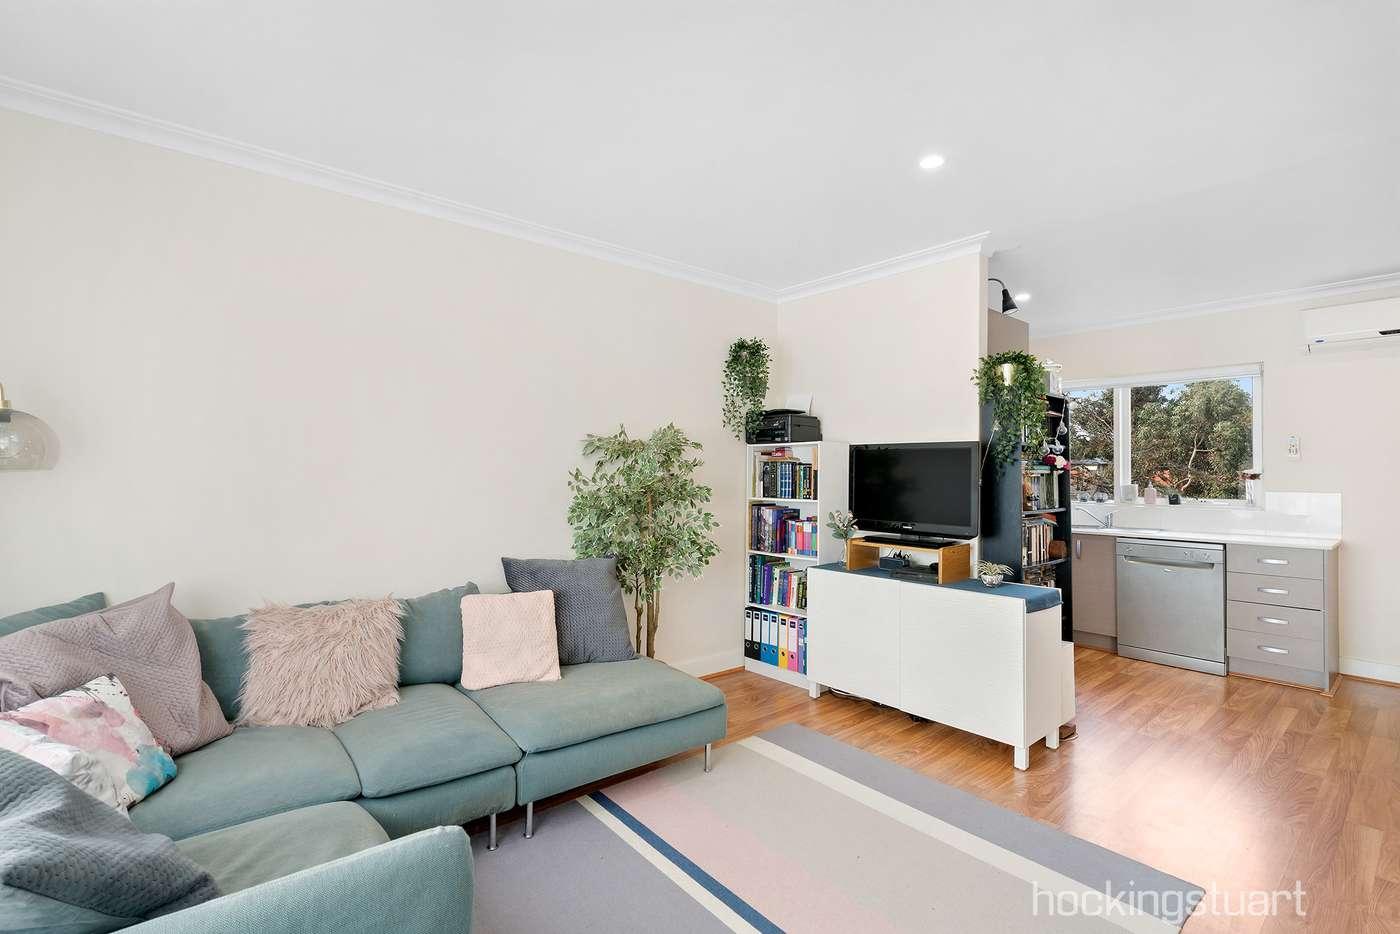 Fifth view of Homely flat listing, 7/20 Bradshaw Street, Frankston VIC 3199